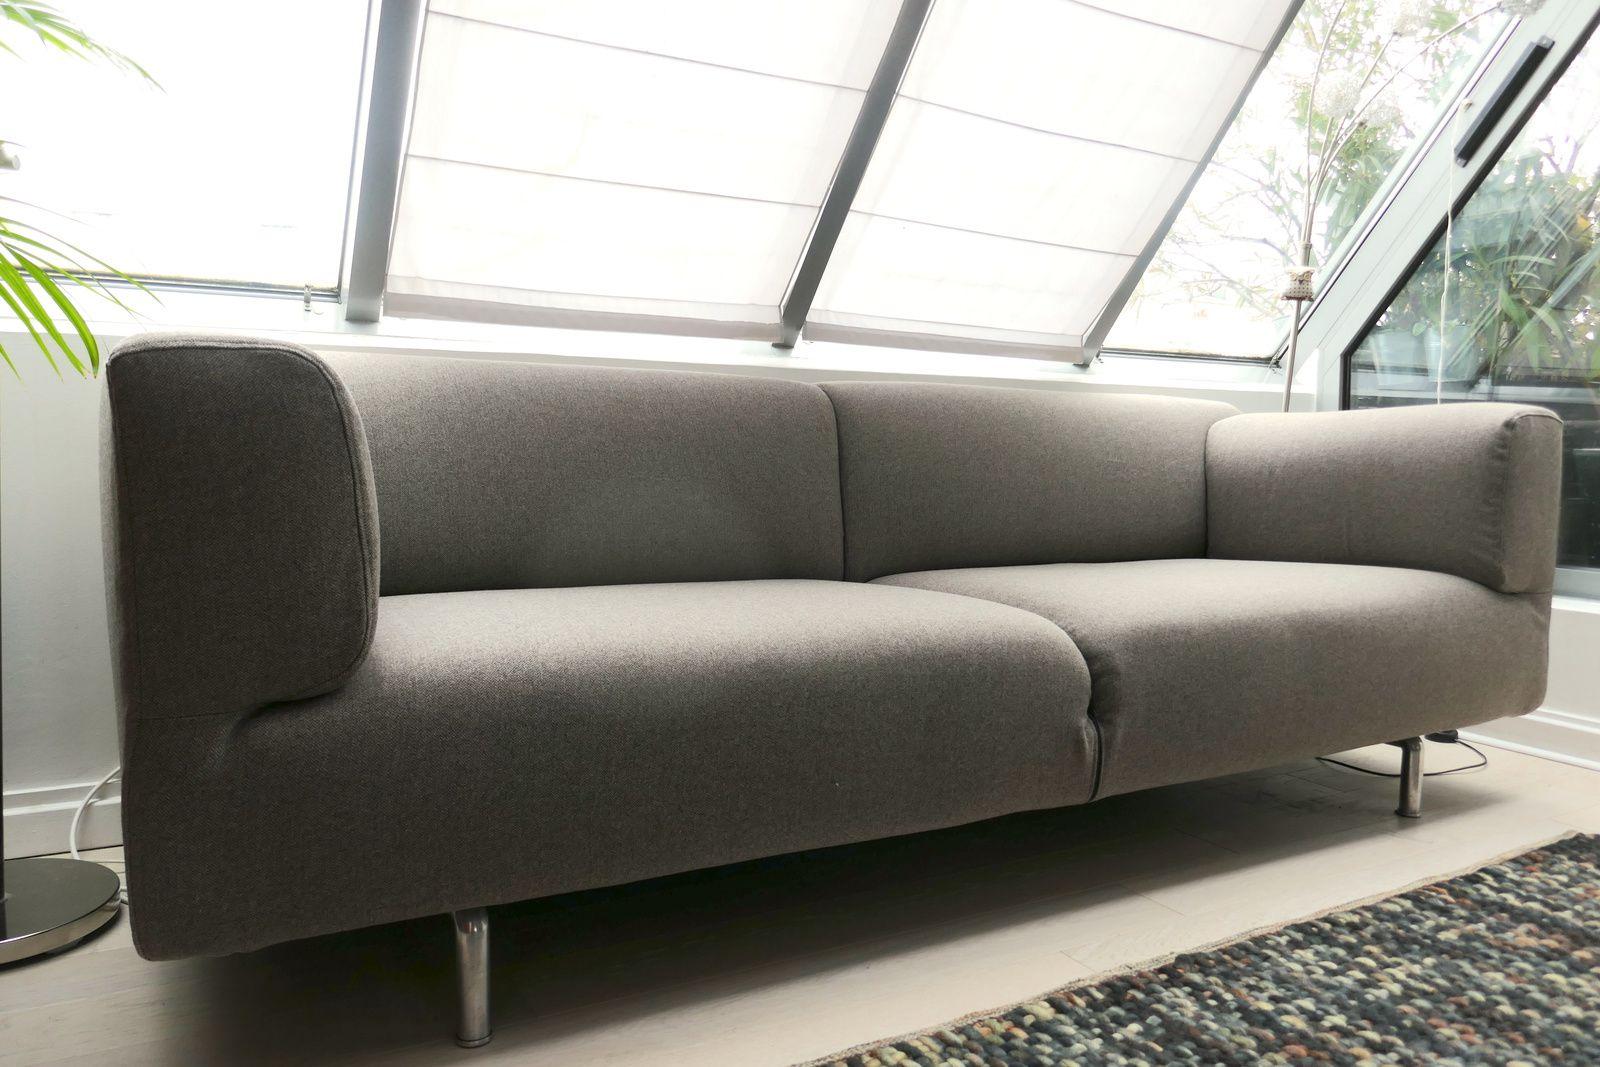 La canapé MET de Cassina, un revêtement sur mesure !